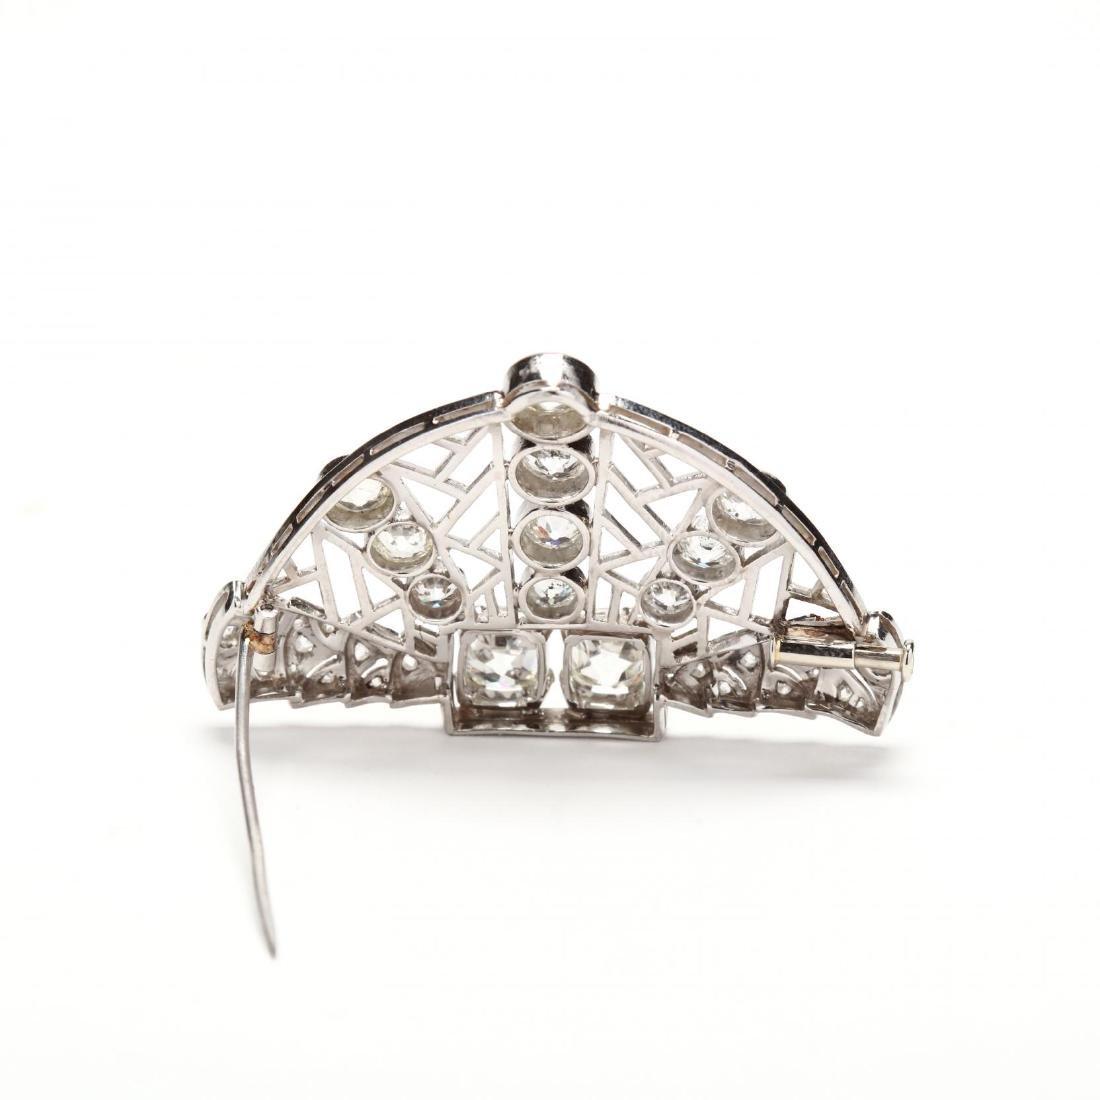 Antique Platinum and Diamond Brooch, Janesich - 2